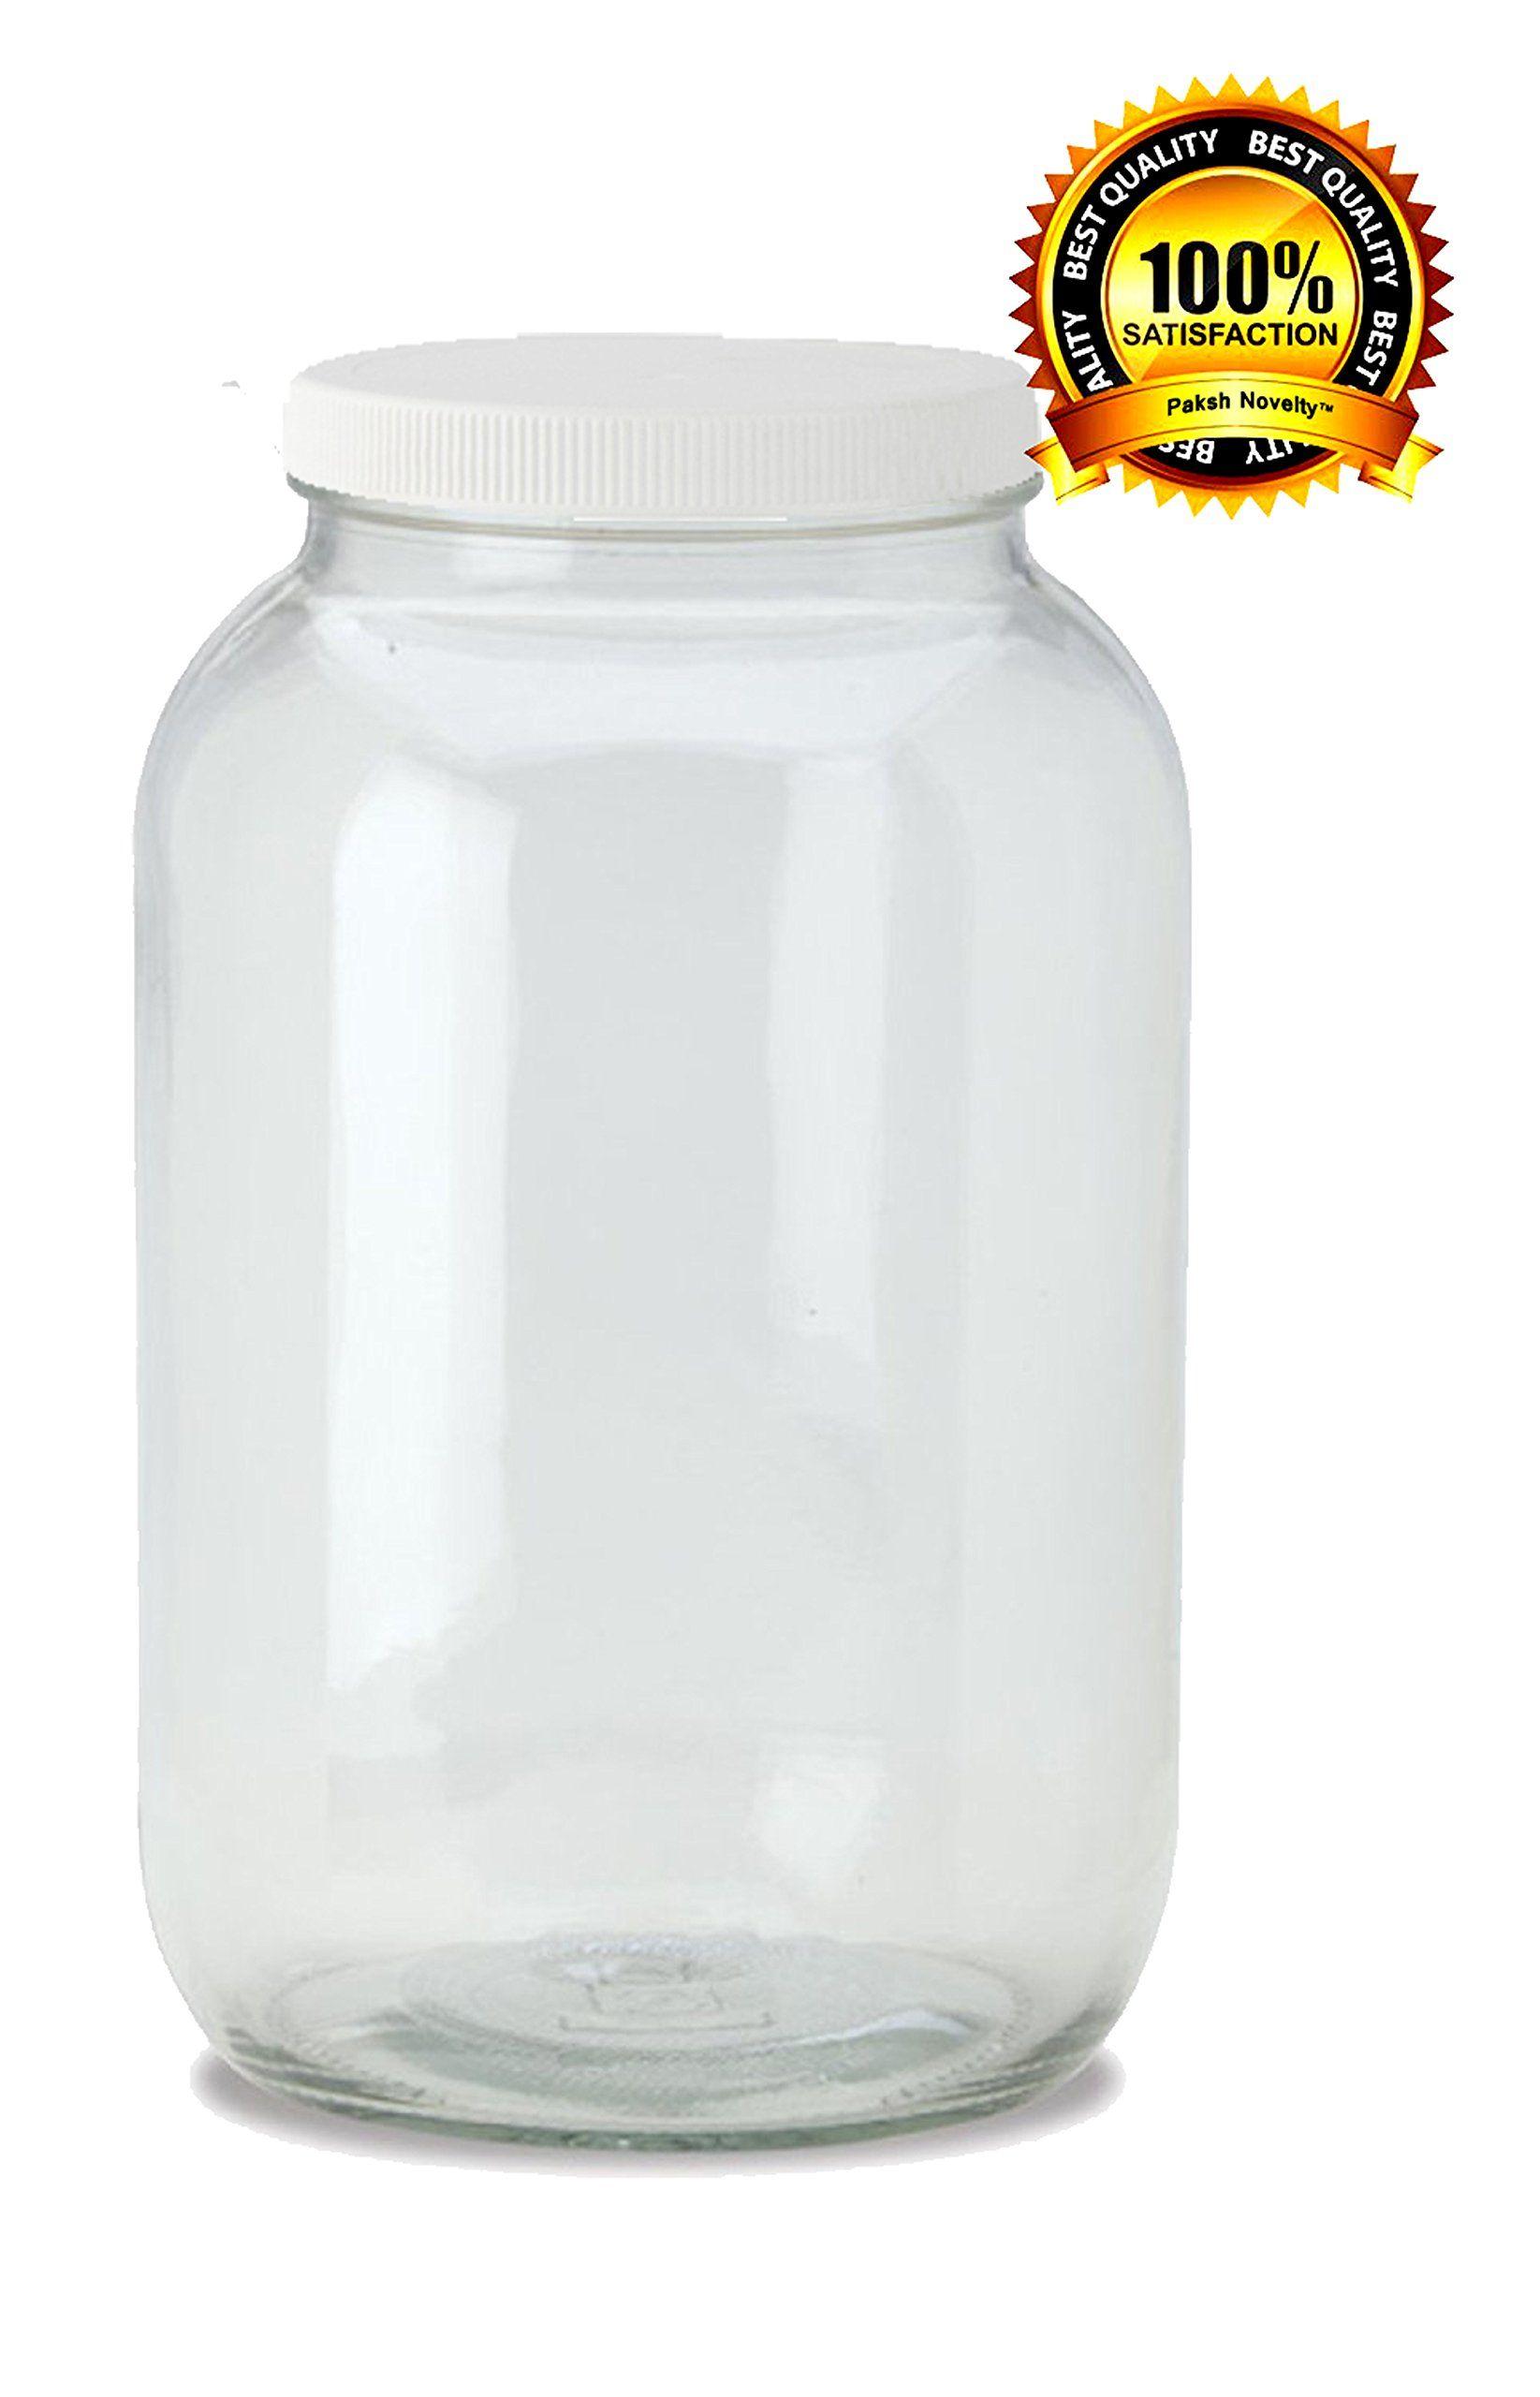 Amazon Com Paksh Novelty 1 Gallon Usda Kombucha Fermentation Glass Jar With White Plastic Lid Kitche Clear Glass Jars Gallon Glass Jars Kombucha Fermentation